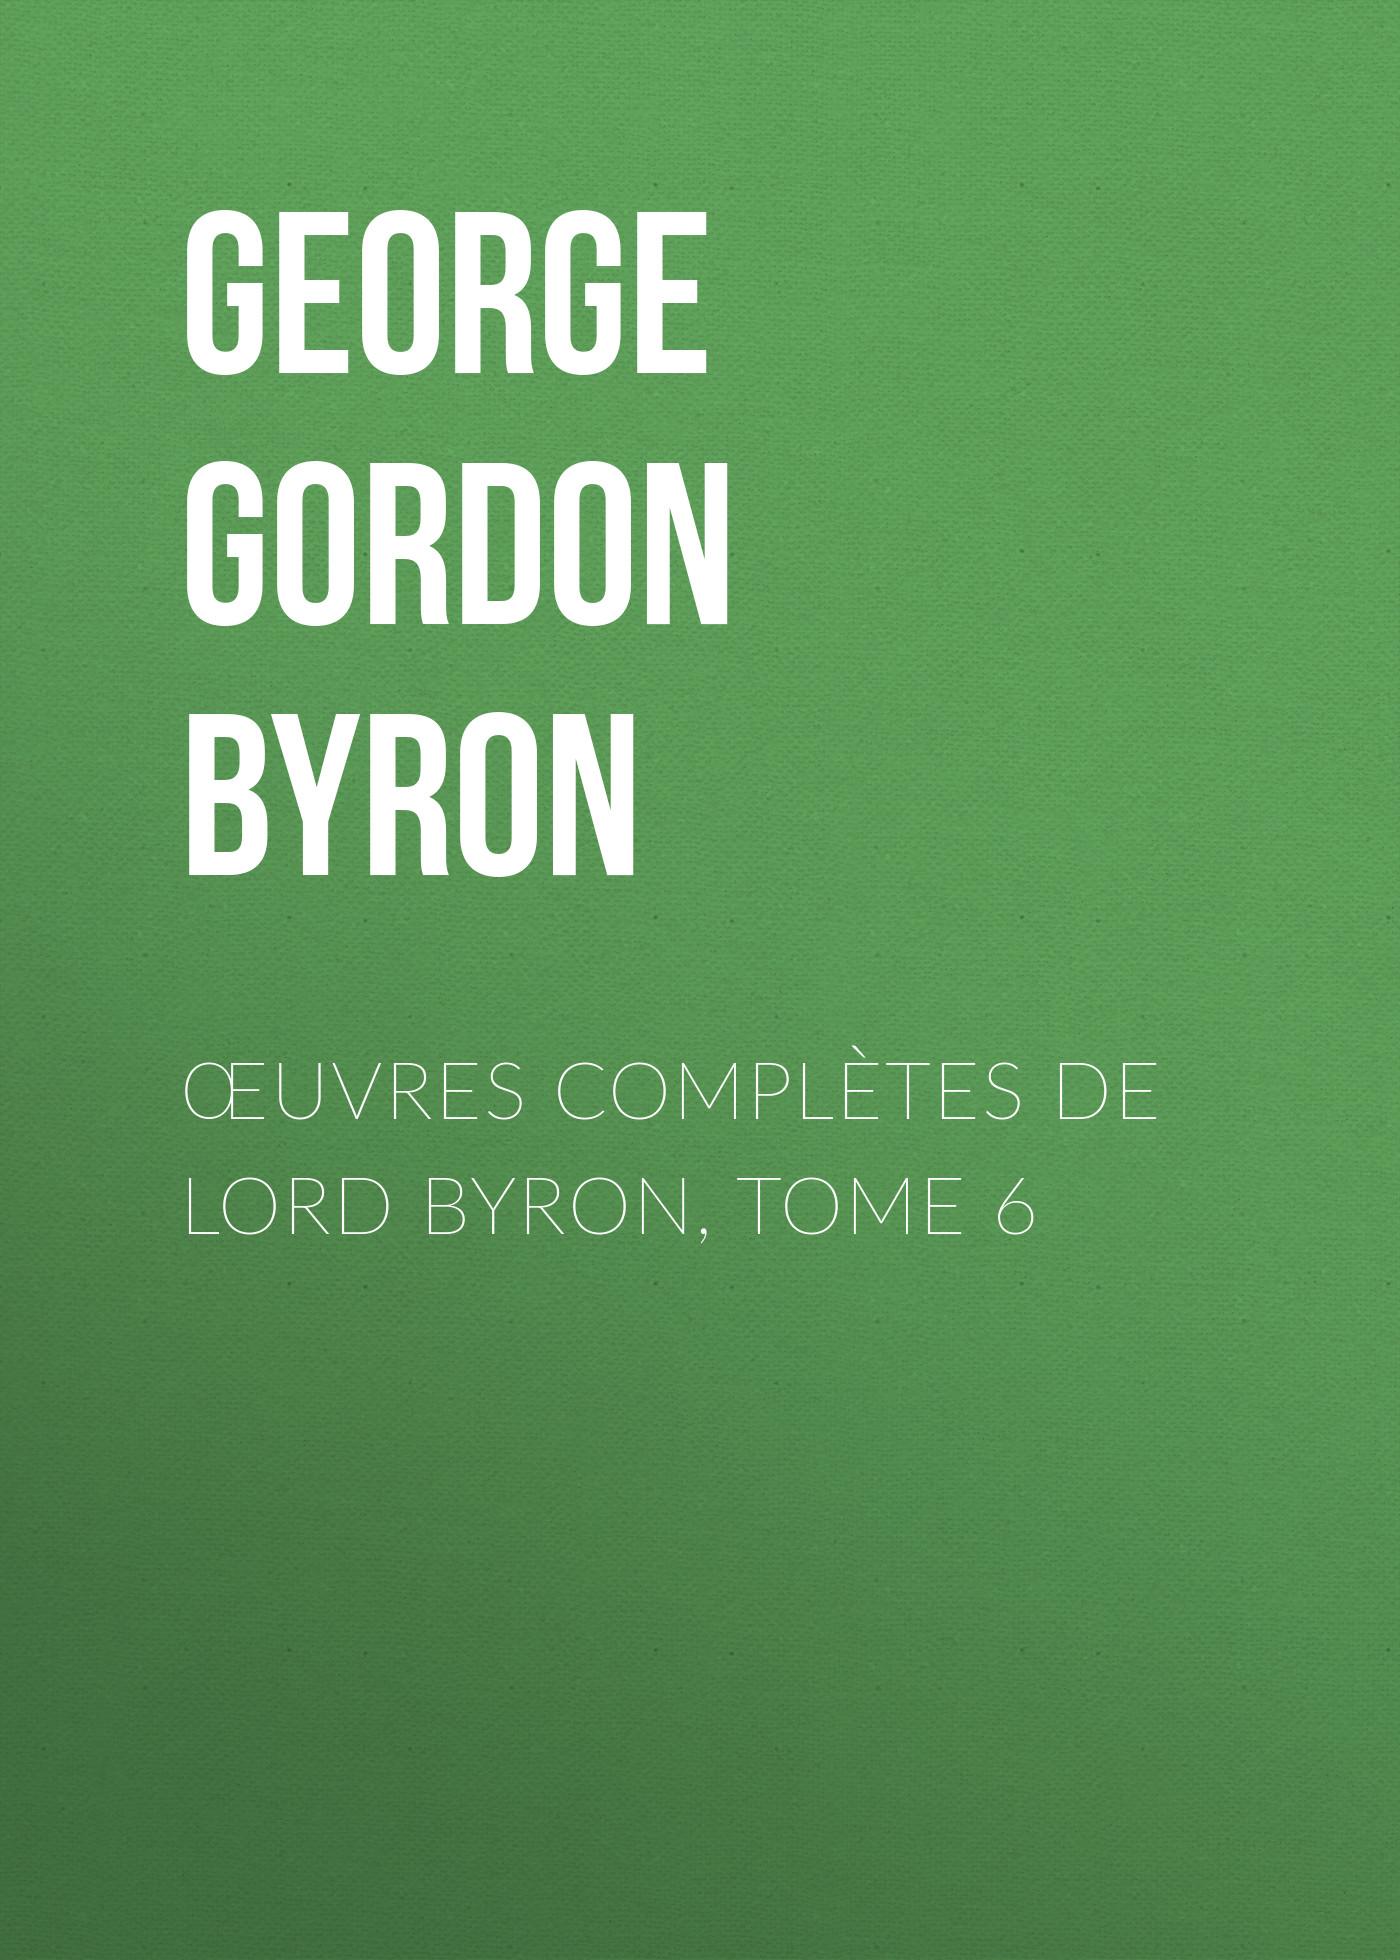 Джордж Гордон Байрон Œuvres complètes de lord Byron, Tome 6 thomas medwin conversations of lord byron